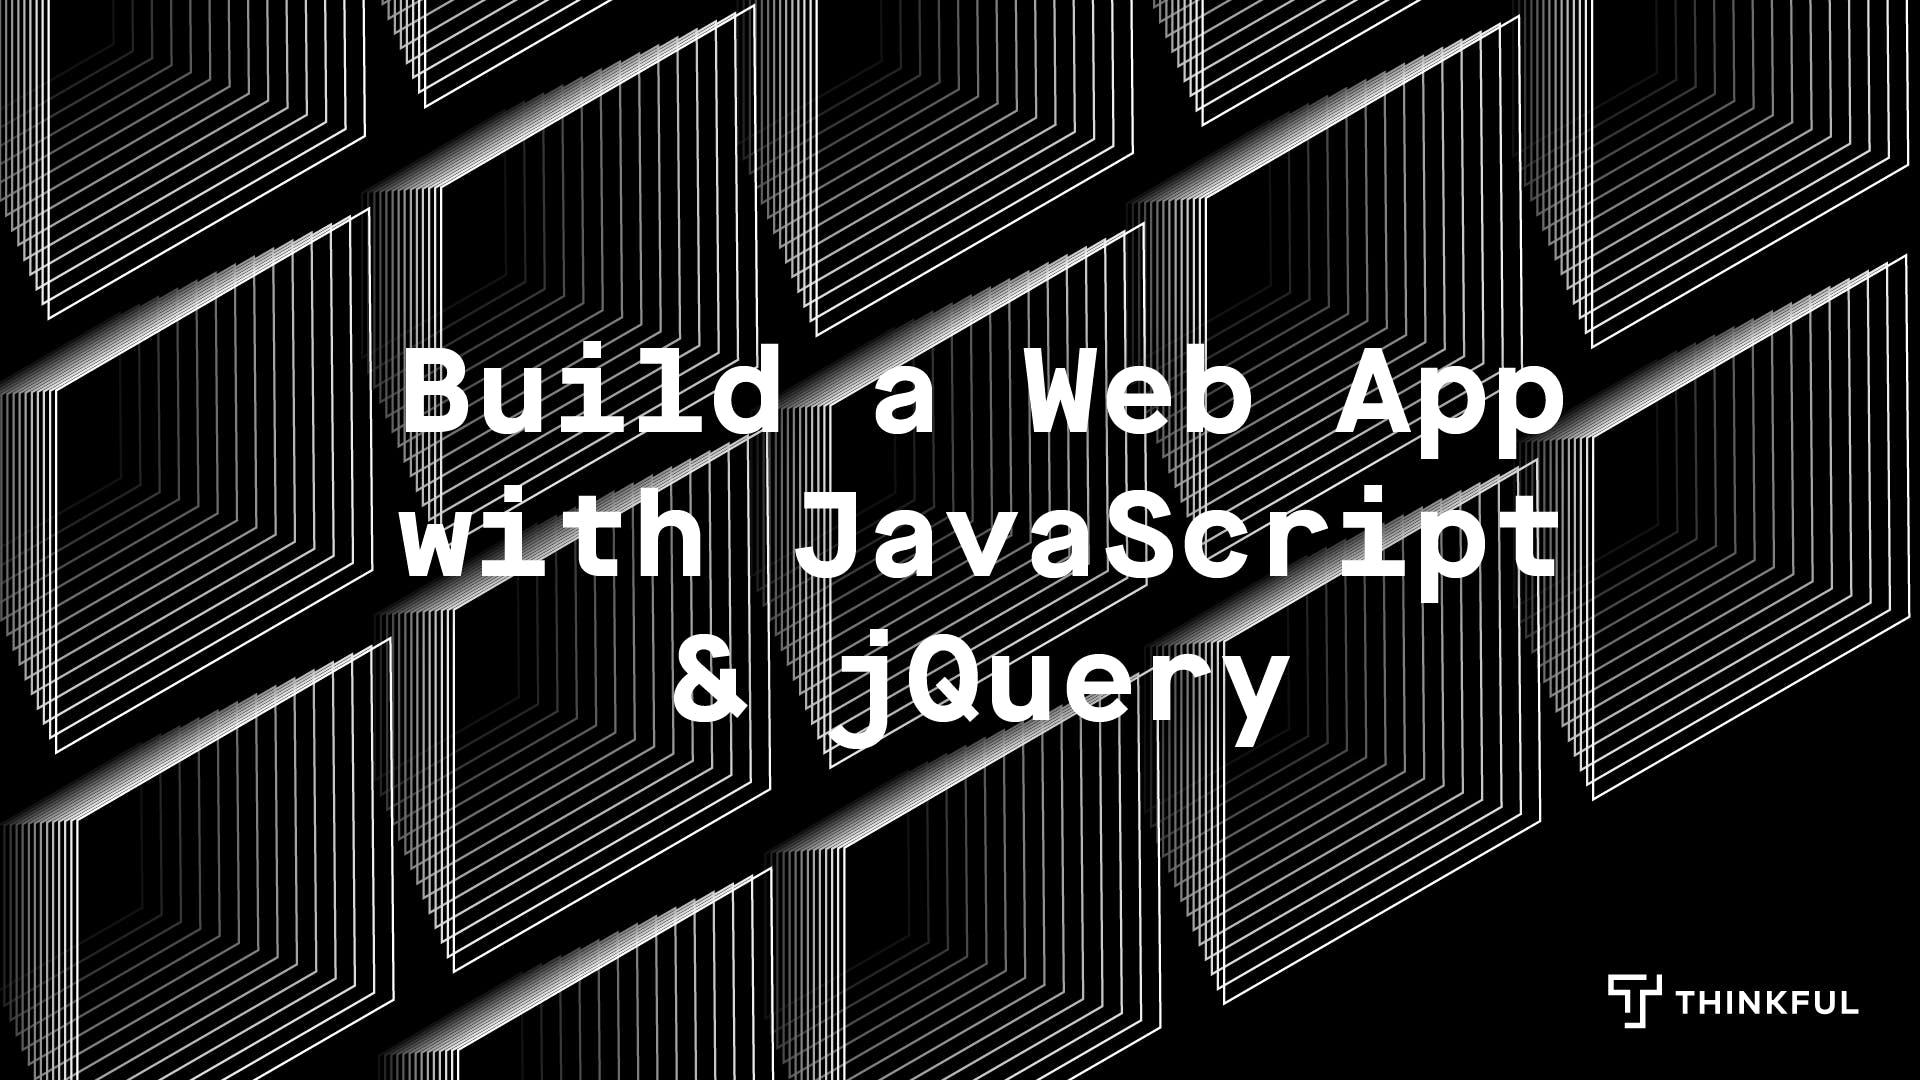 Thinkful Webinar: Build a Web App with JavaSc